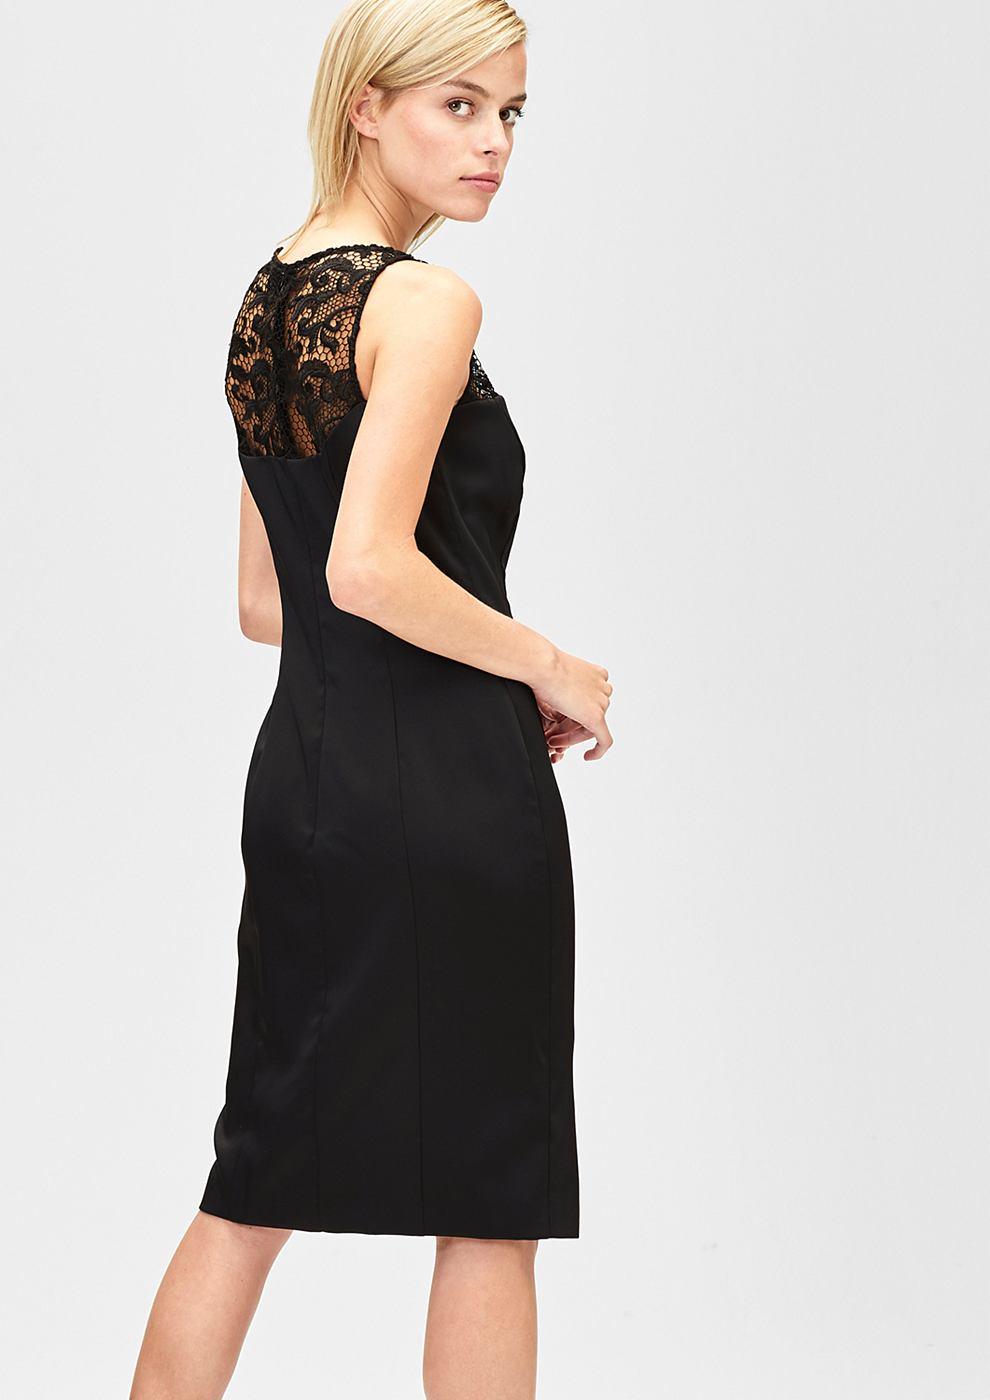 s.Oliver Premium satijnen jurk met kant zwart